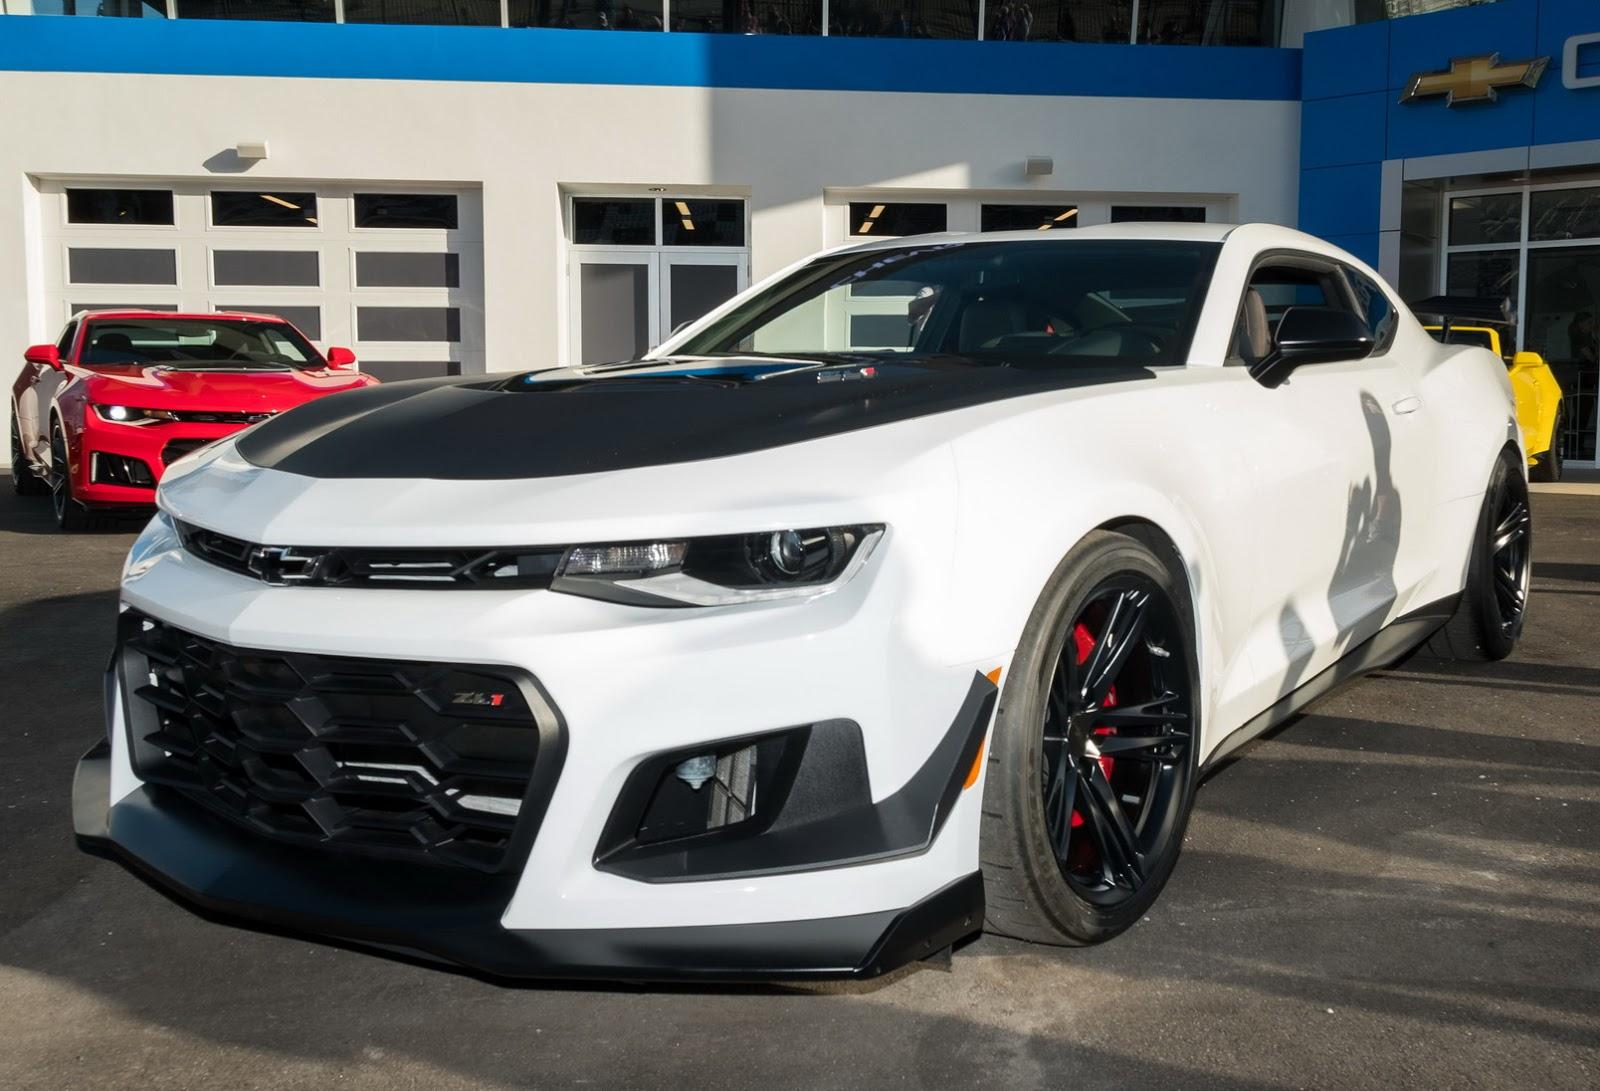 2018 Camaro Price List Reveals 100 Increase In Base Price